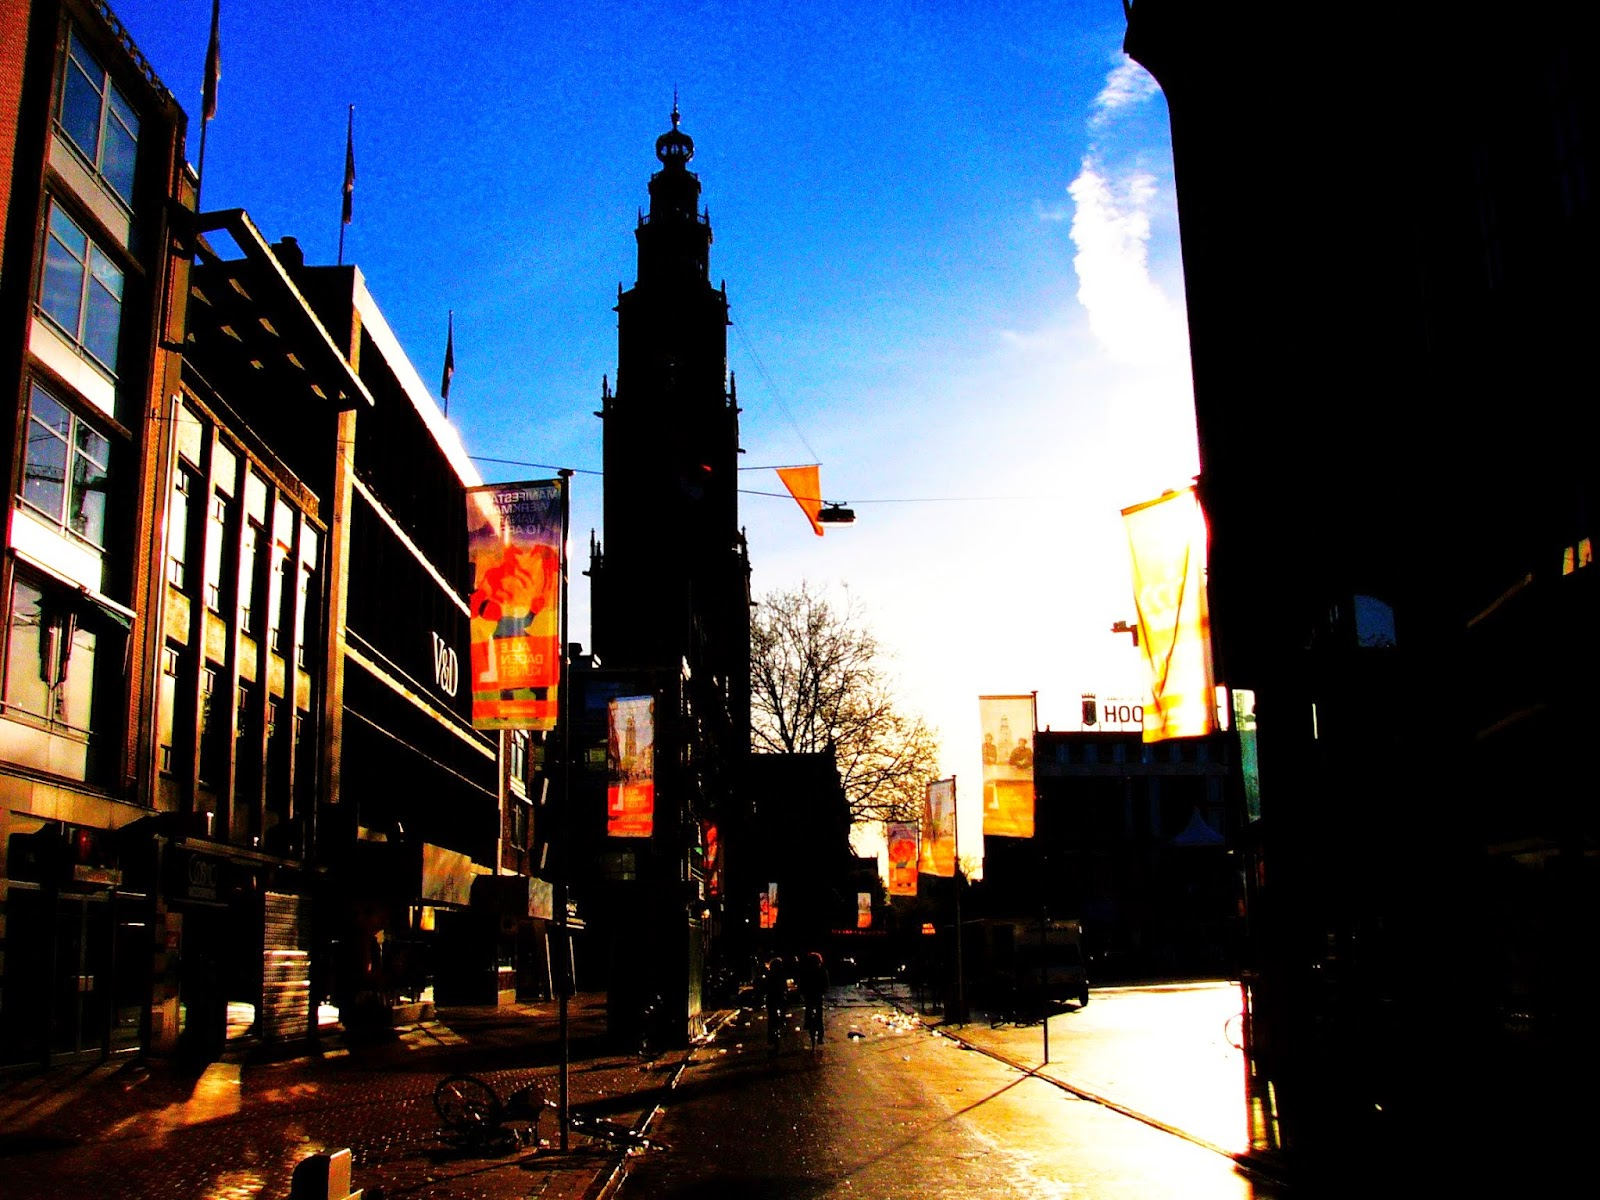 "<img src=""2015-Koningsdag-Groningen.jpg"" alt="" Zonsopkomst rond de Martinitoren met vlag en wimpel behangen.""></a>"